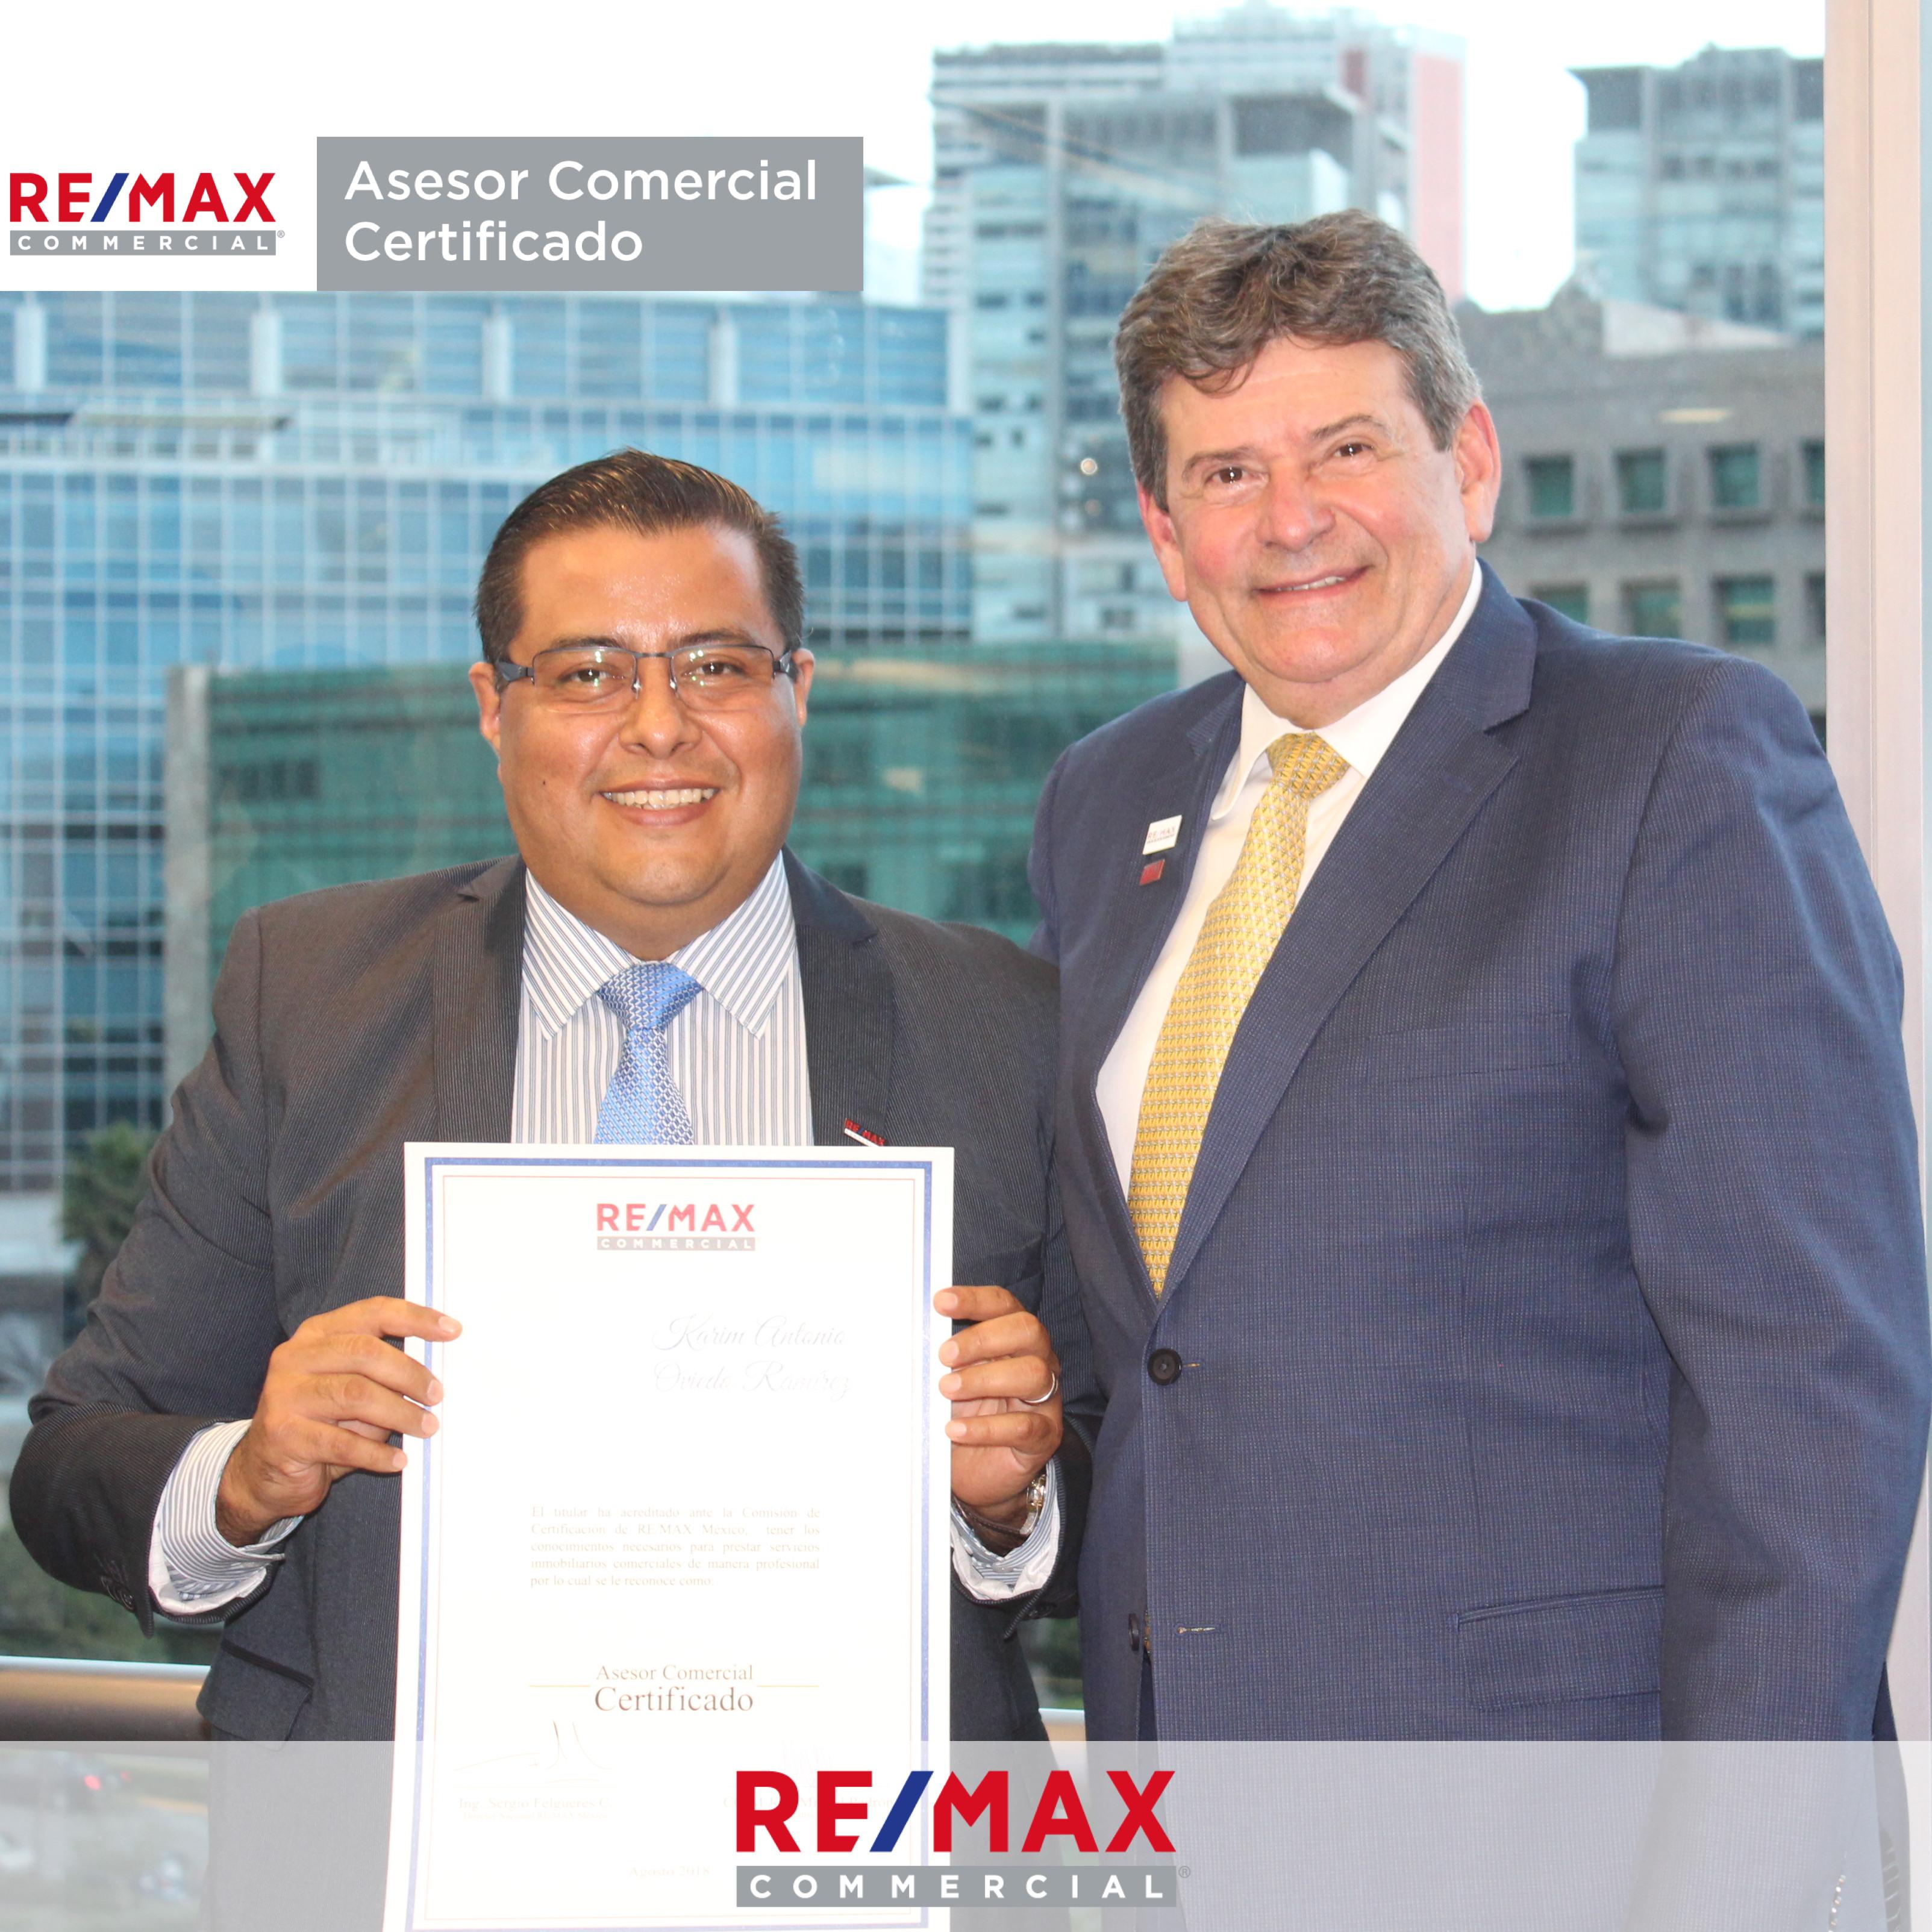 09_Certificacion_comercial_comprar_rentar_vender_casa_departamento_franquicias_inmobiliarias_REMAX_mexico_propiedades_comerciales_terrenos_bodegas